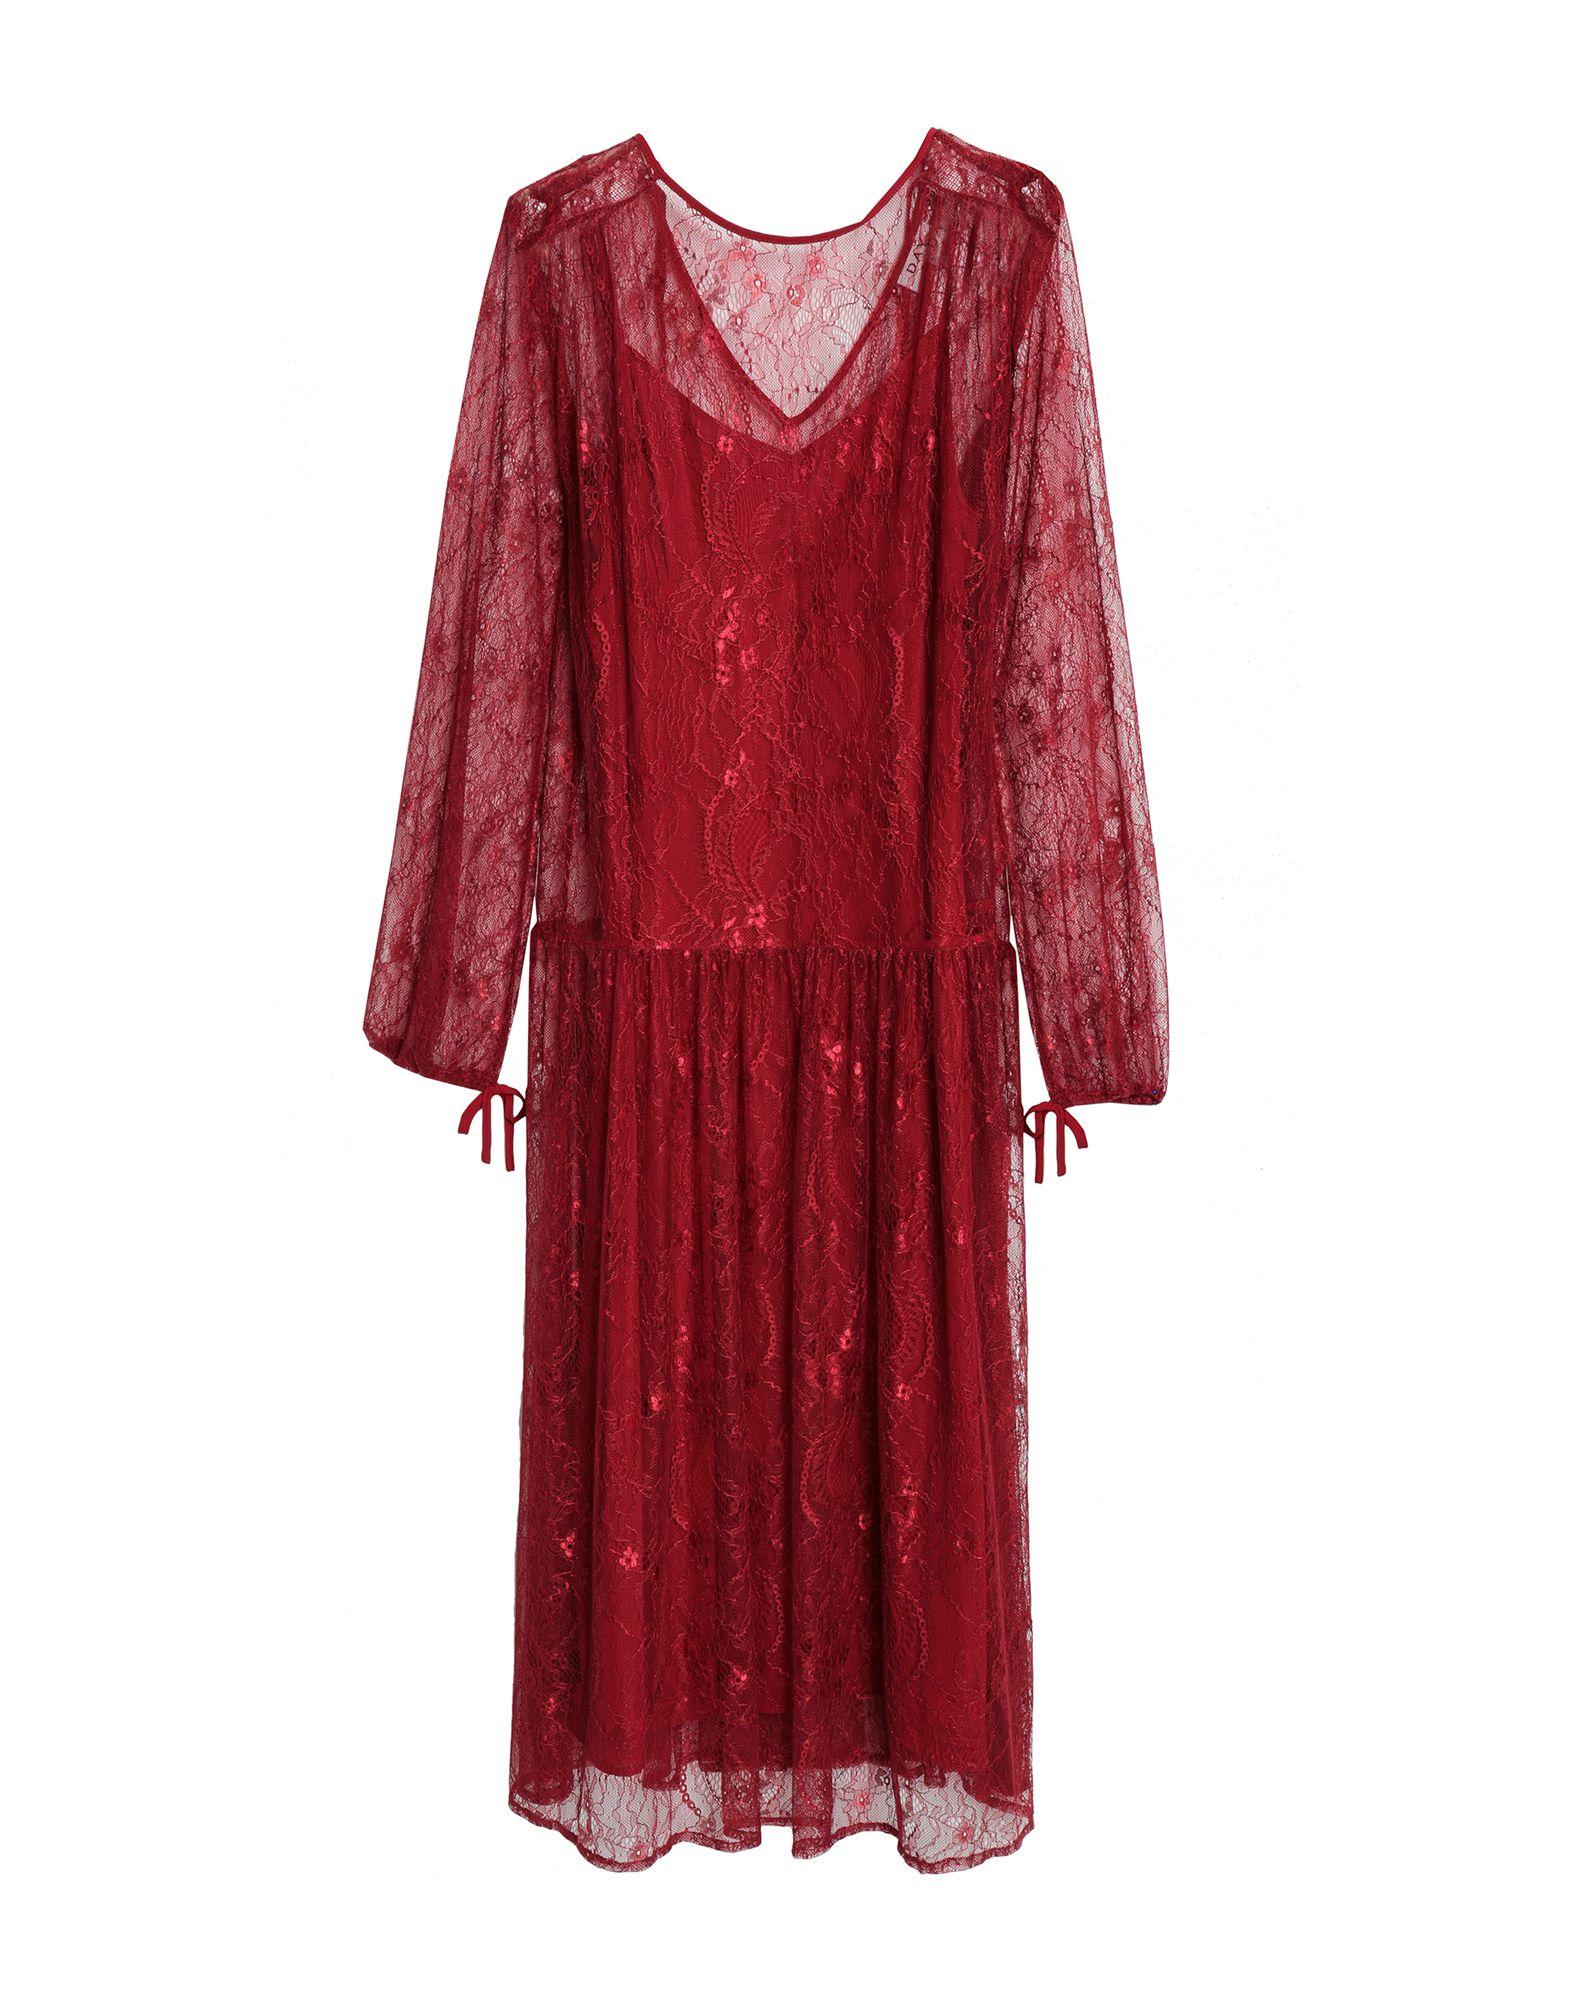 DAY BIRGER ET MIKKELSEN Платье длиной 3/4